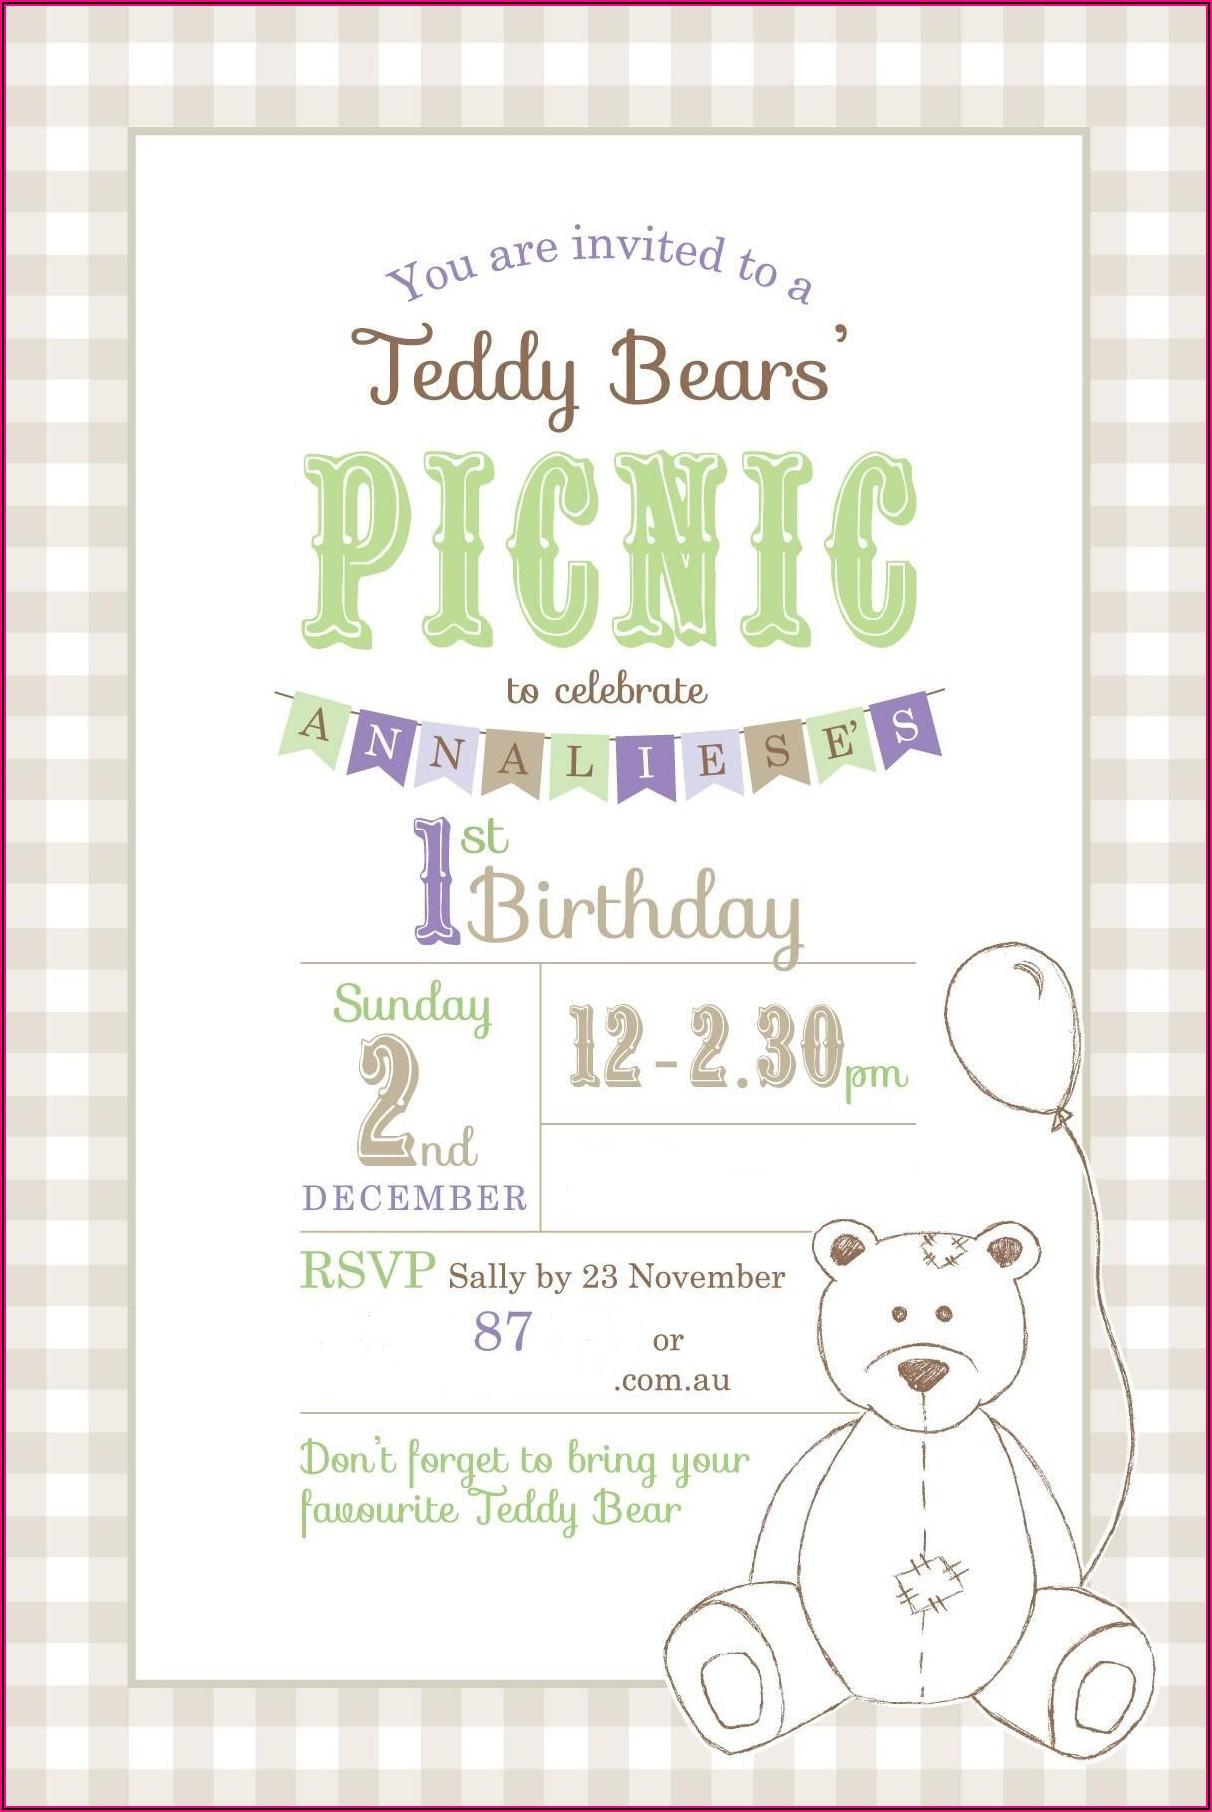 Teddy Bear Picnic Party Invite Template